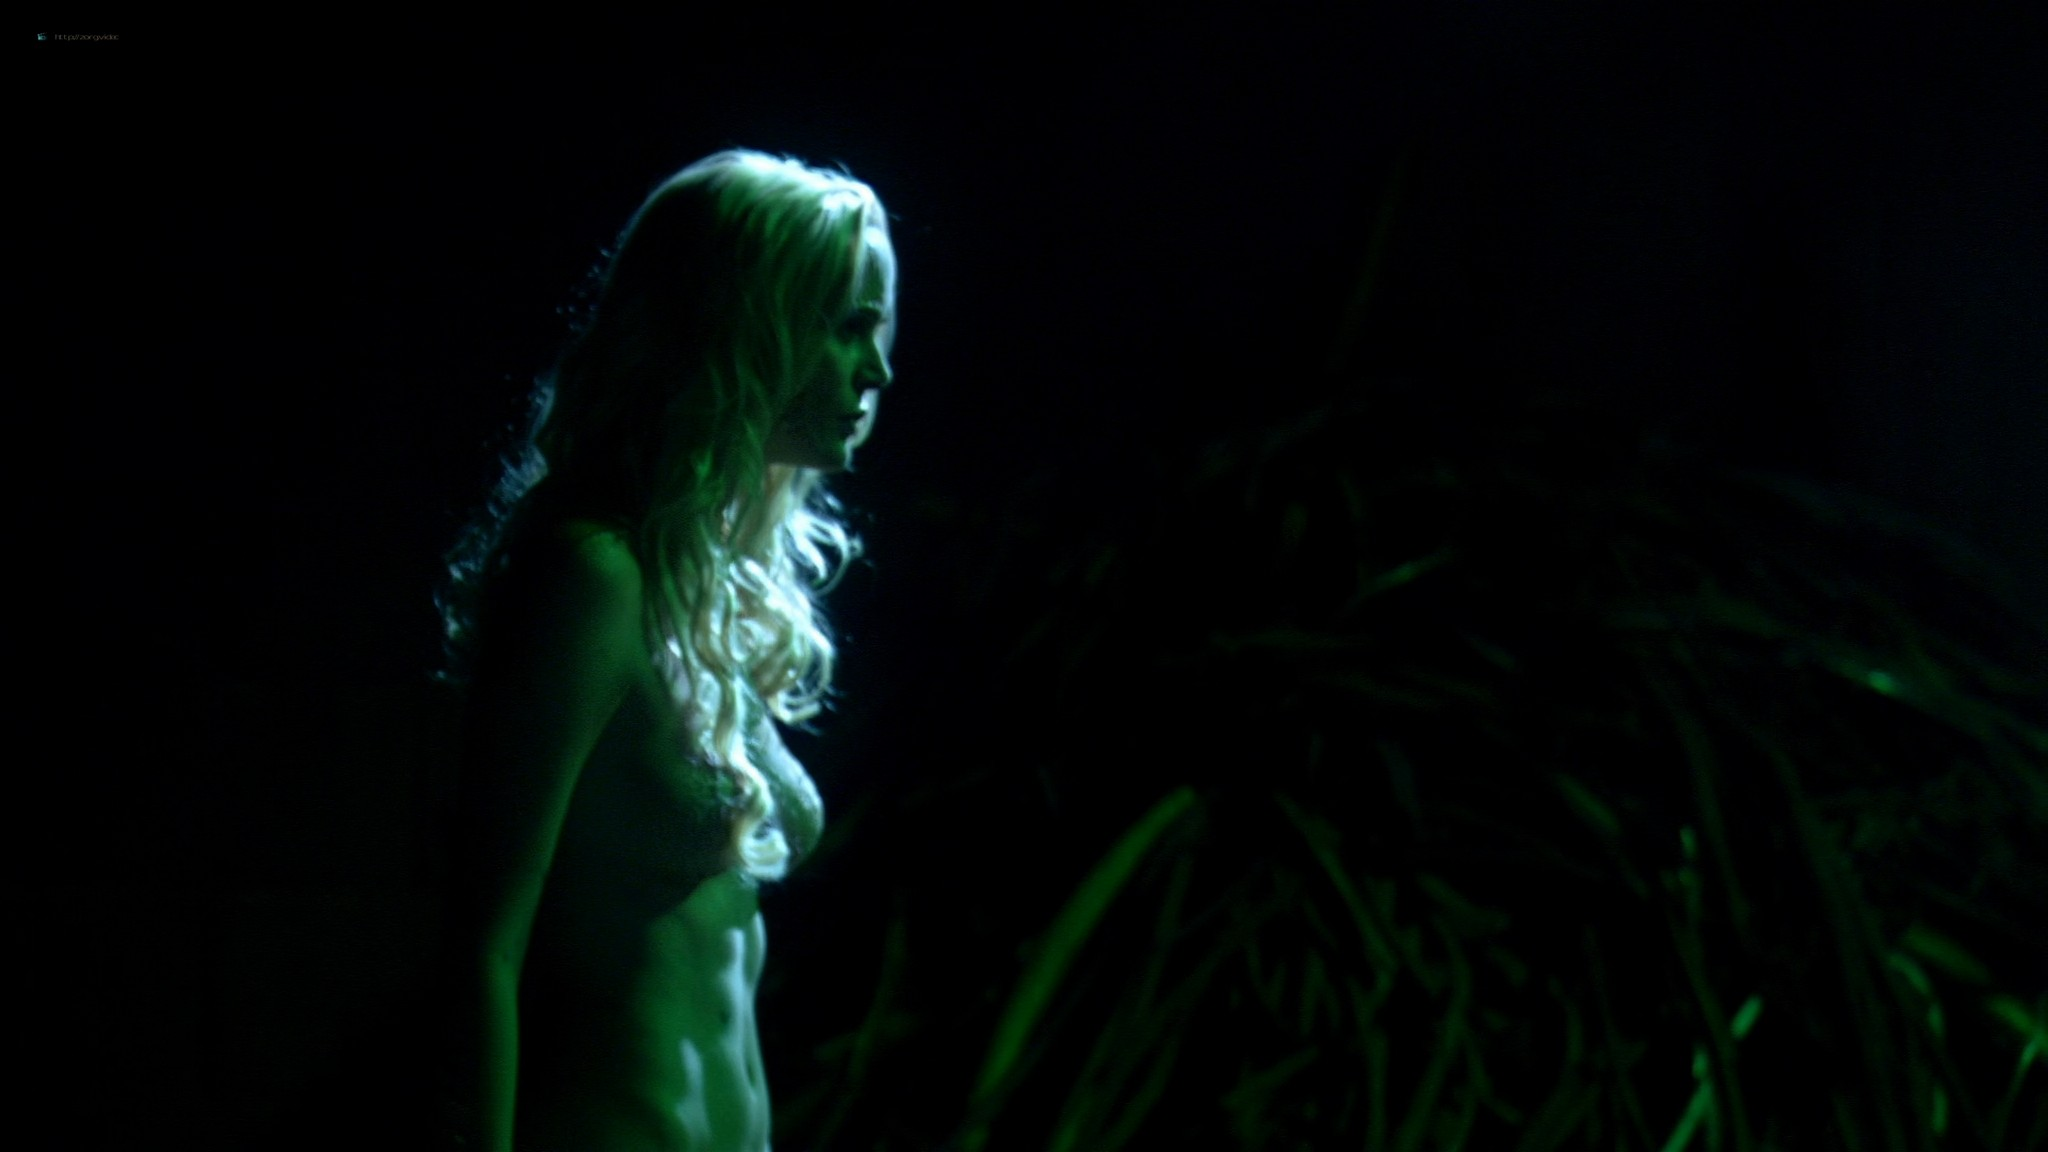 Helena Mattsson nude full frontal and Marlene Favela nude Species The Awakening 2007 HD 1080p BluRay REMUX 016